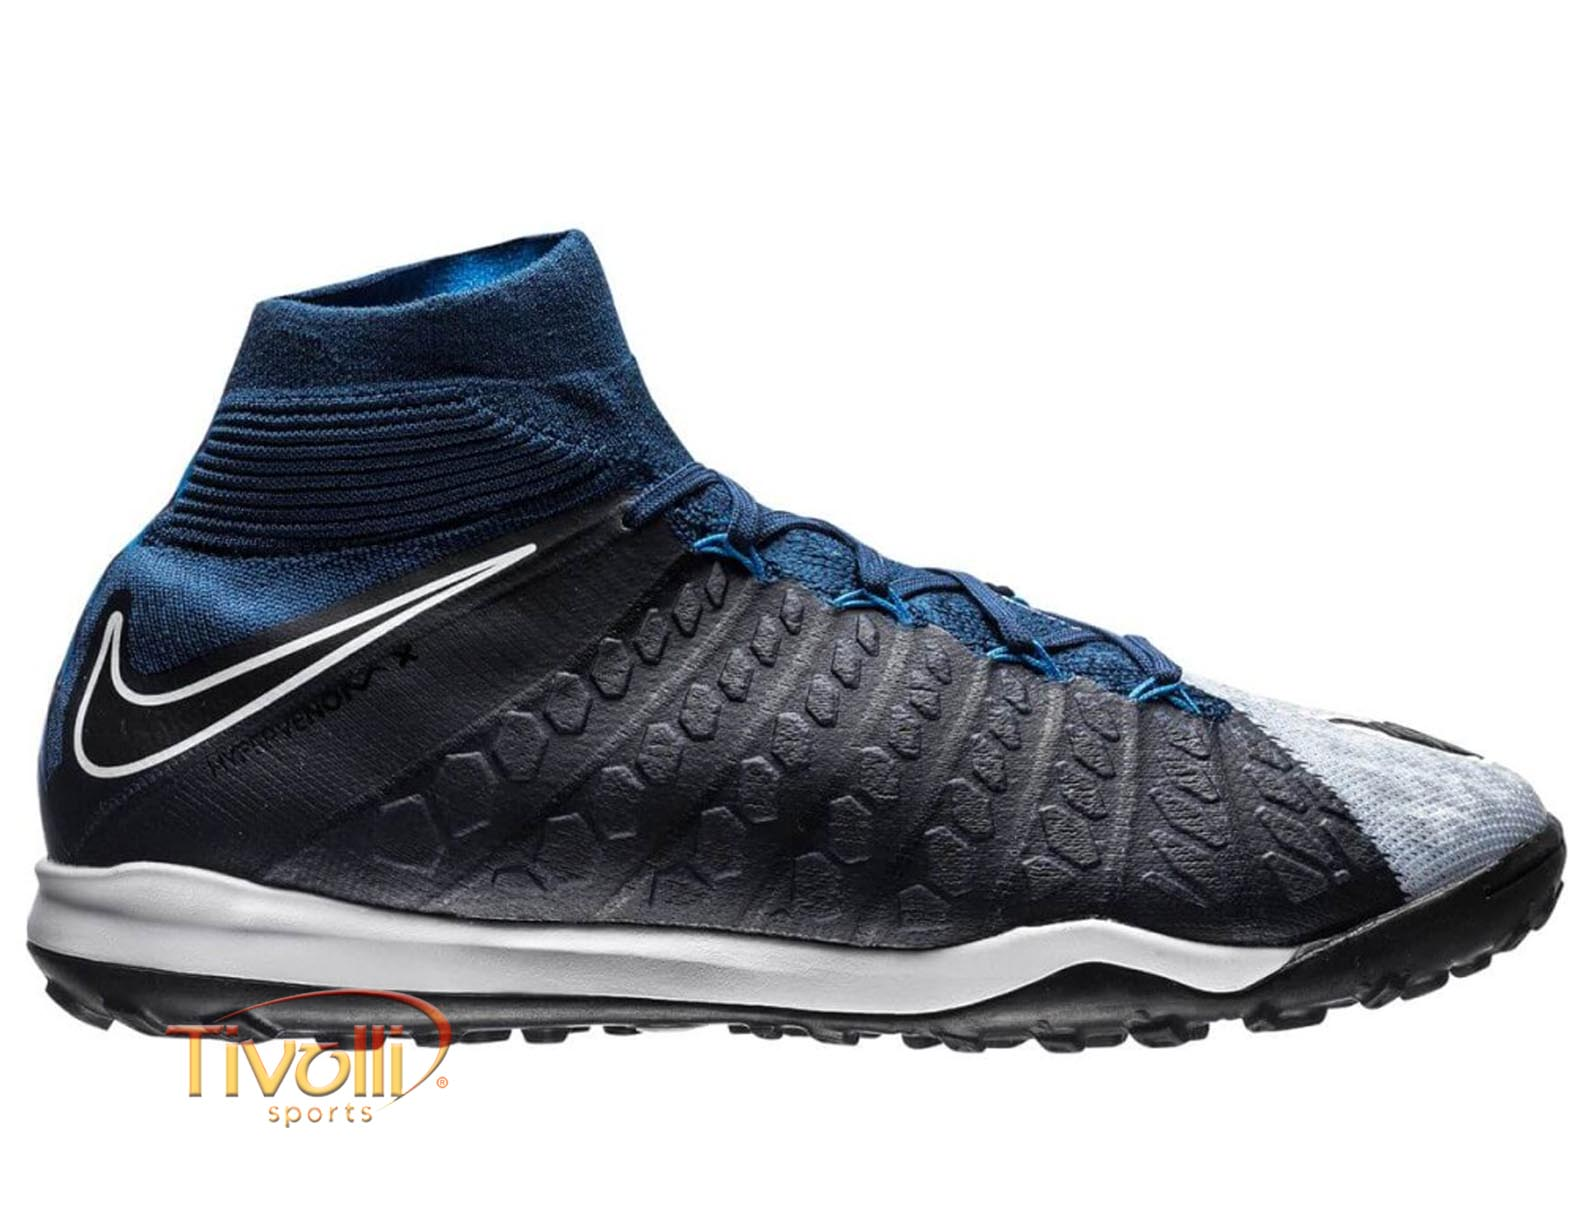 3906c691fcc00 Chuteira Nike HypervenomX Proximo II DF TF Society Azul Marinho, Cinza,  Branca e Preta